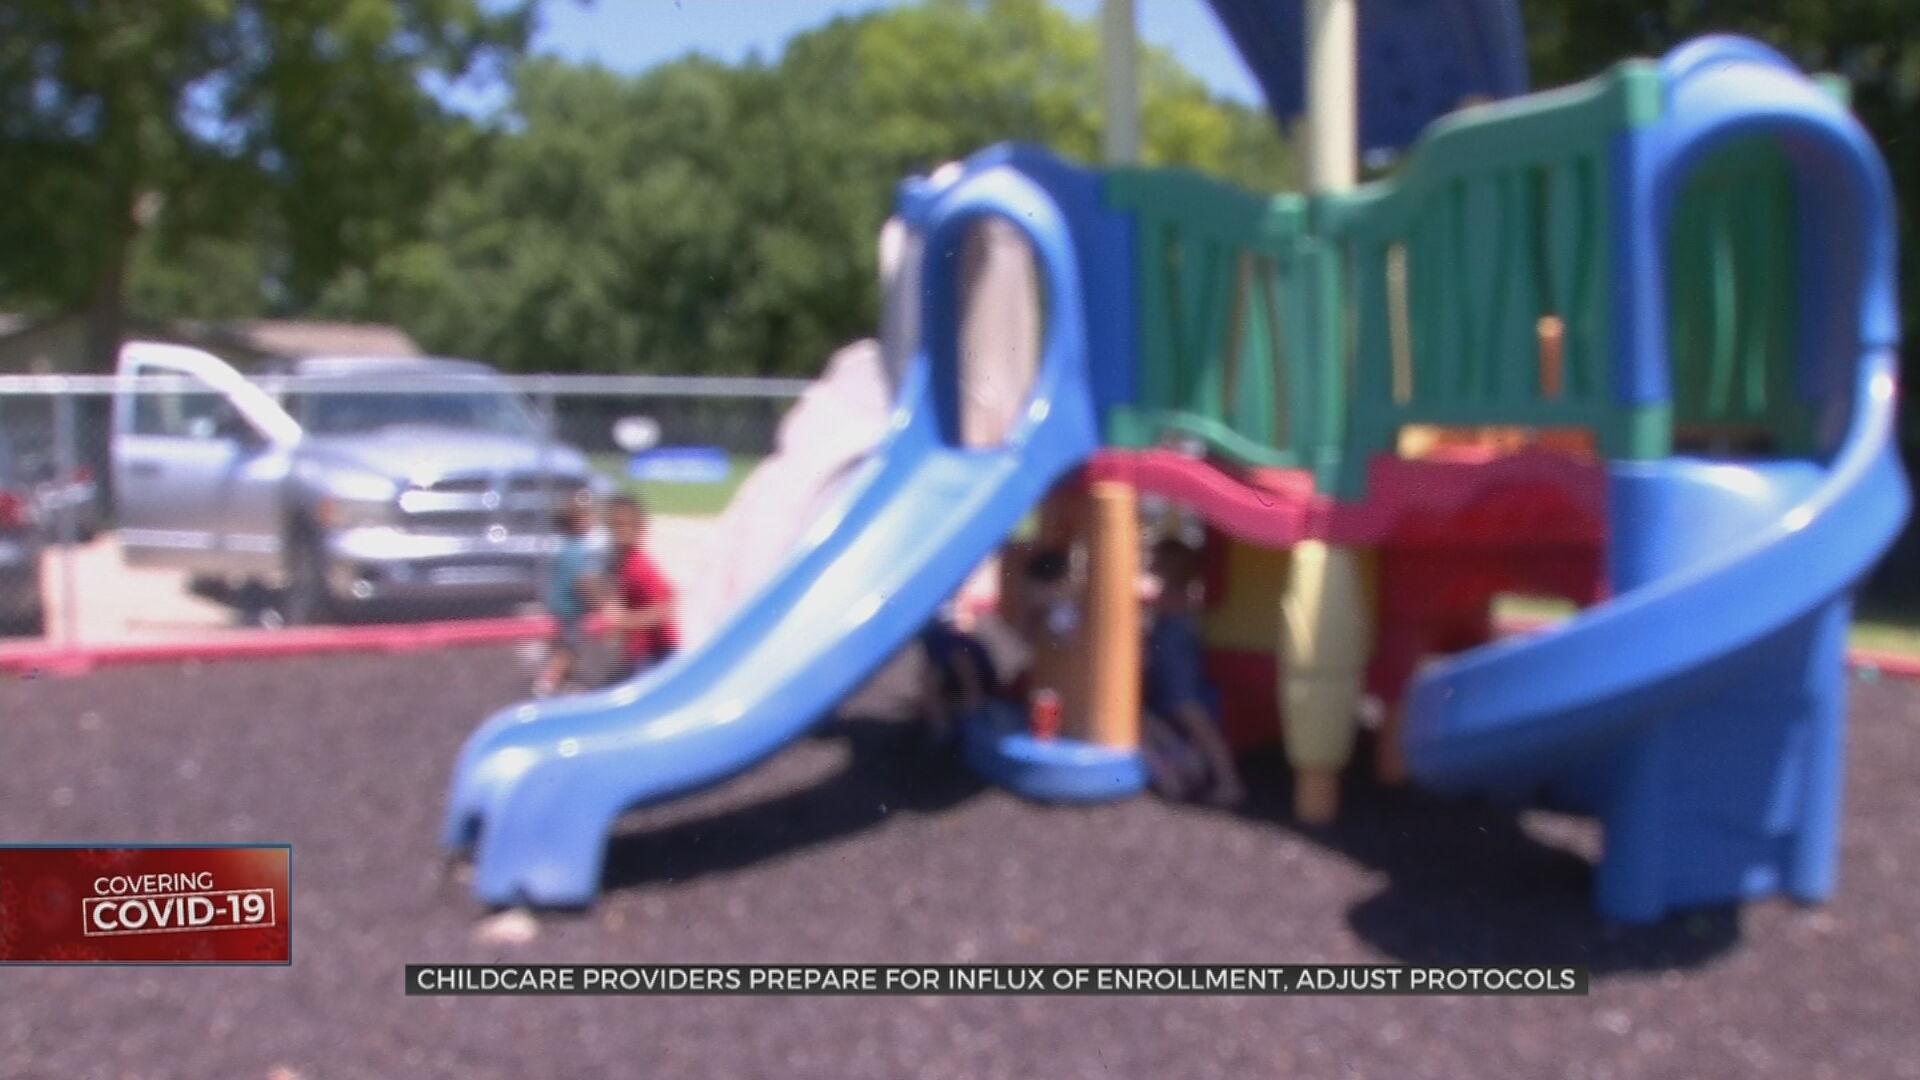 Childcare Providers Prepare For Influx Of Enrollment, Adjust Protocols